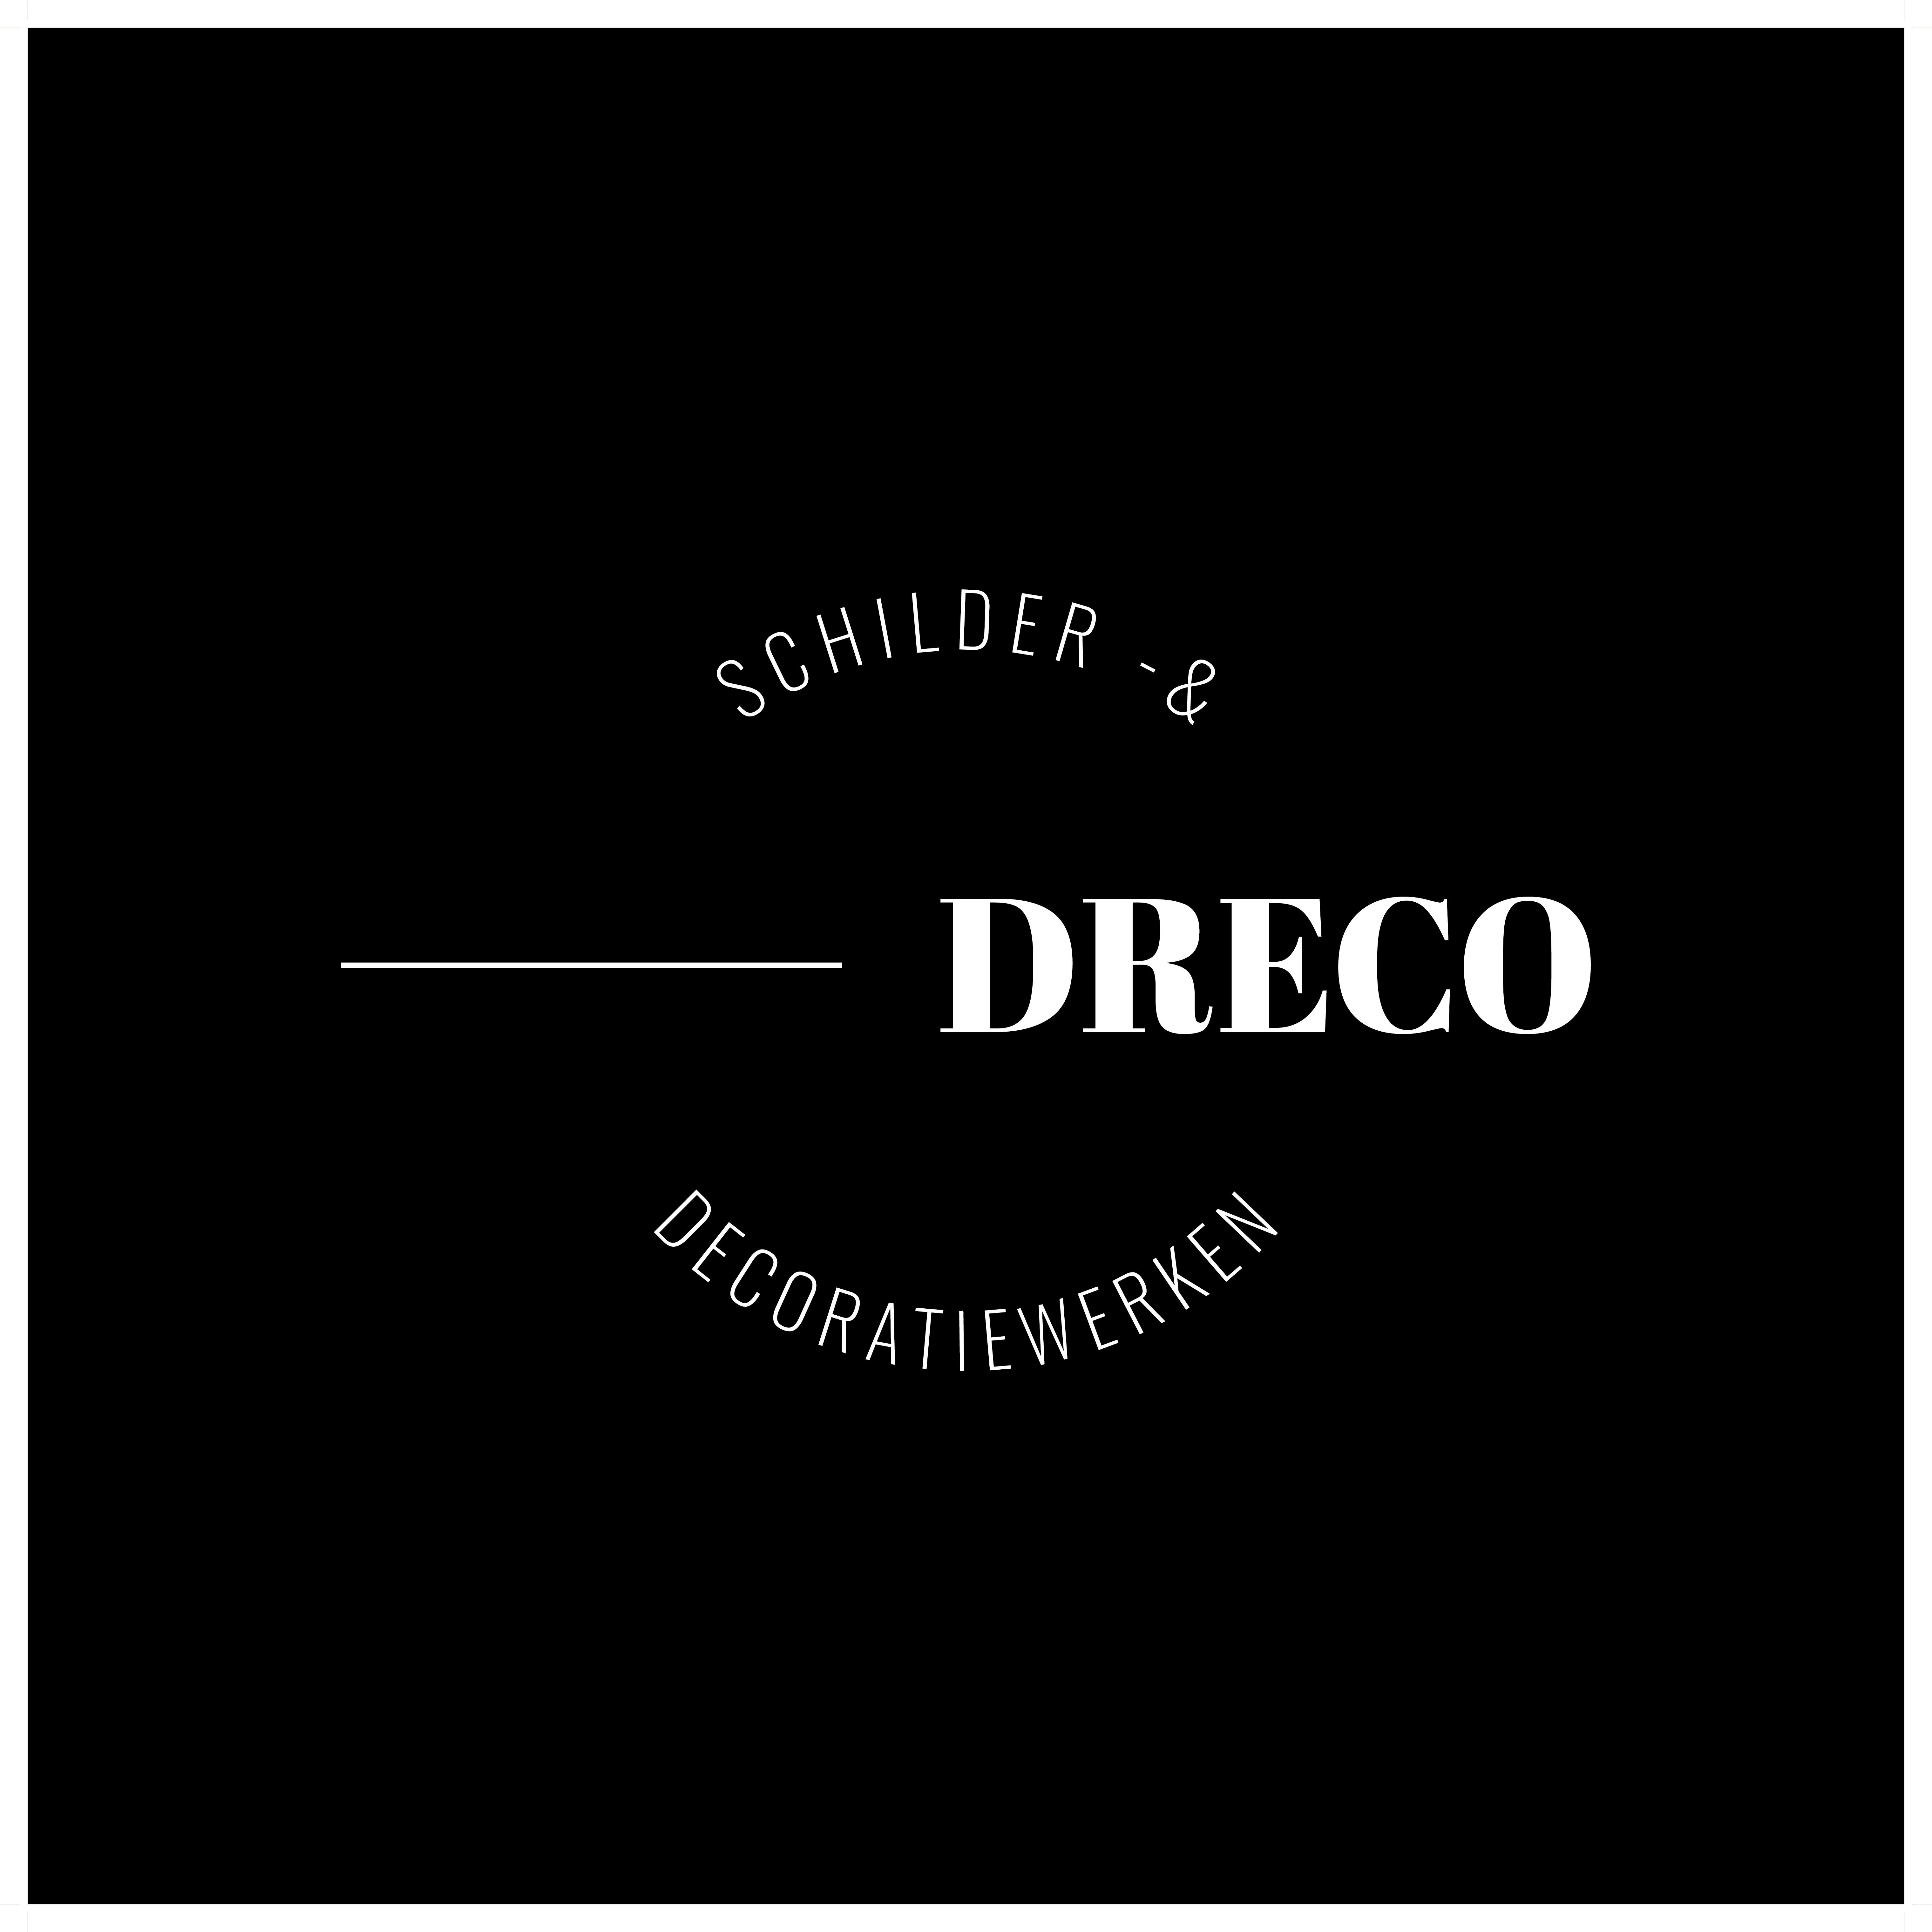 Logo Dreco